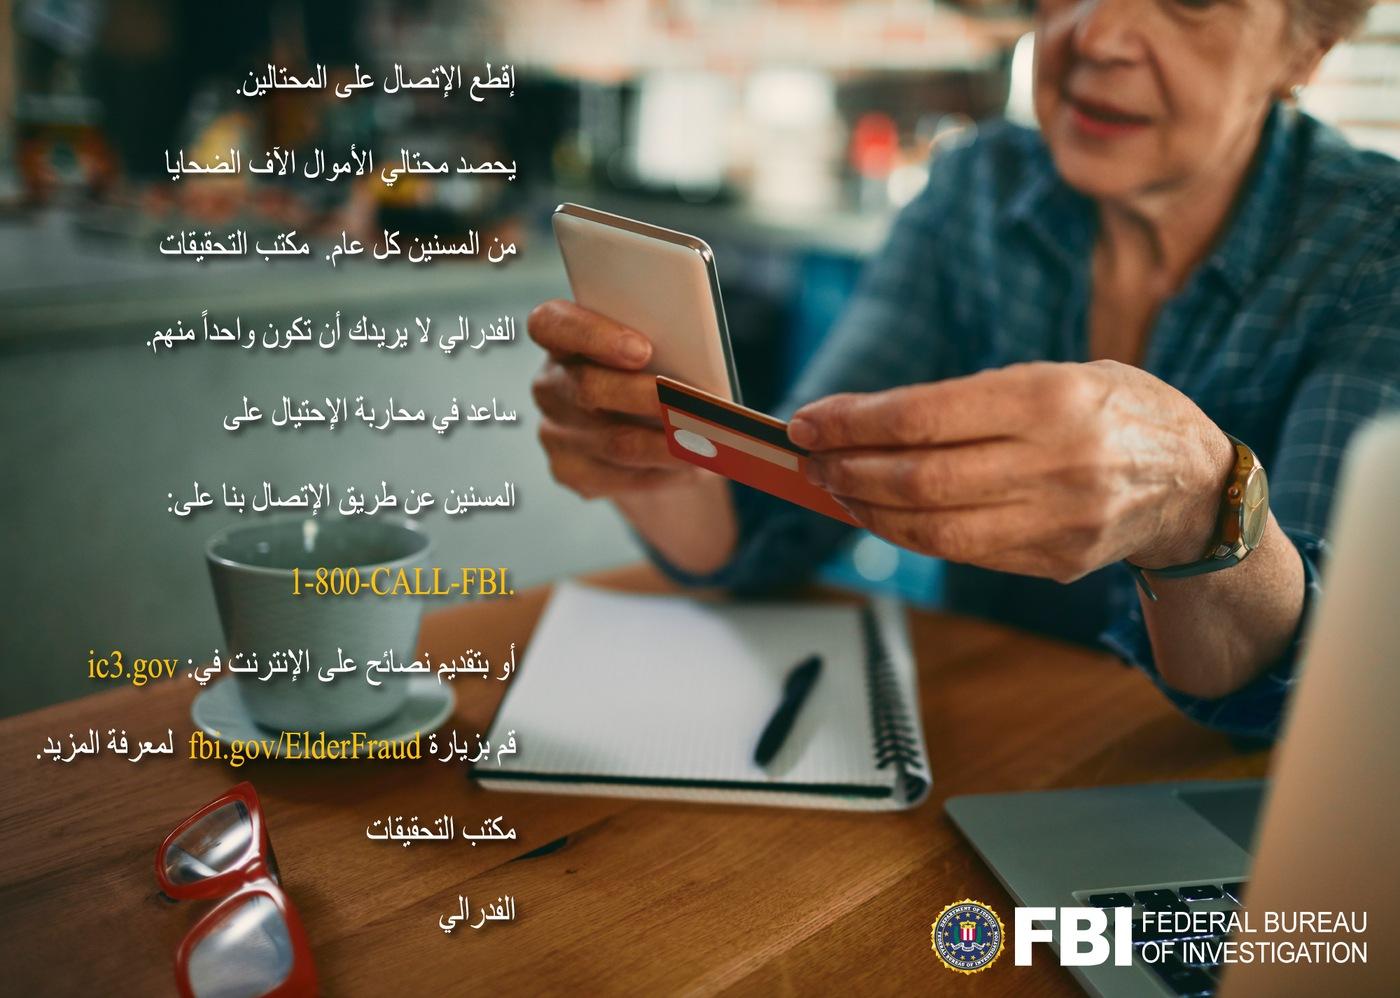 New York Elder Fraud Campaign - Arabic